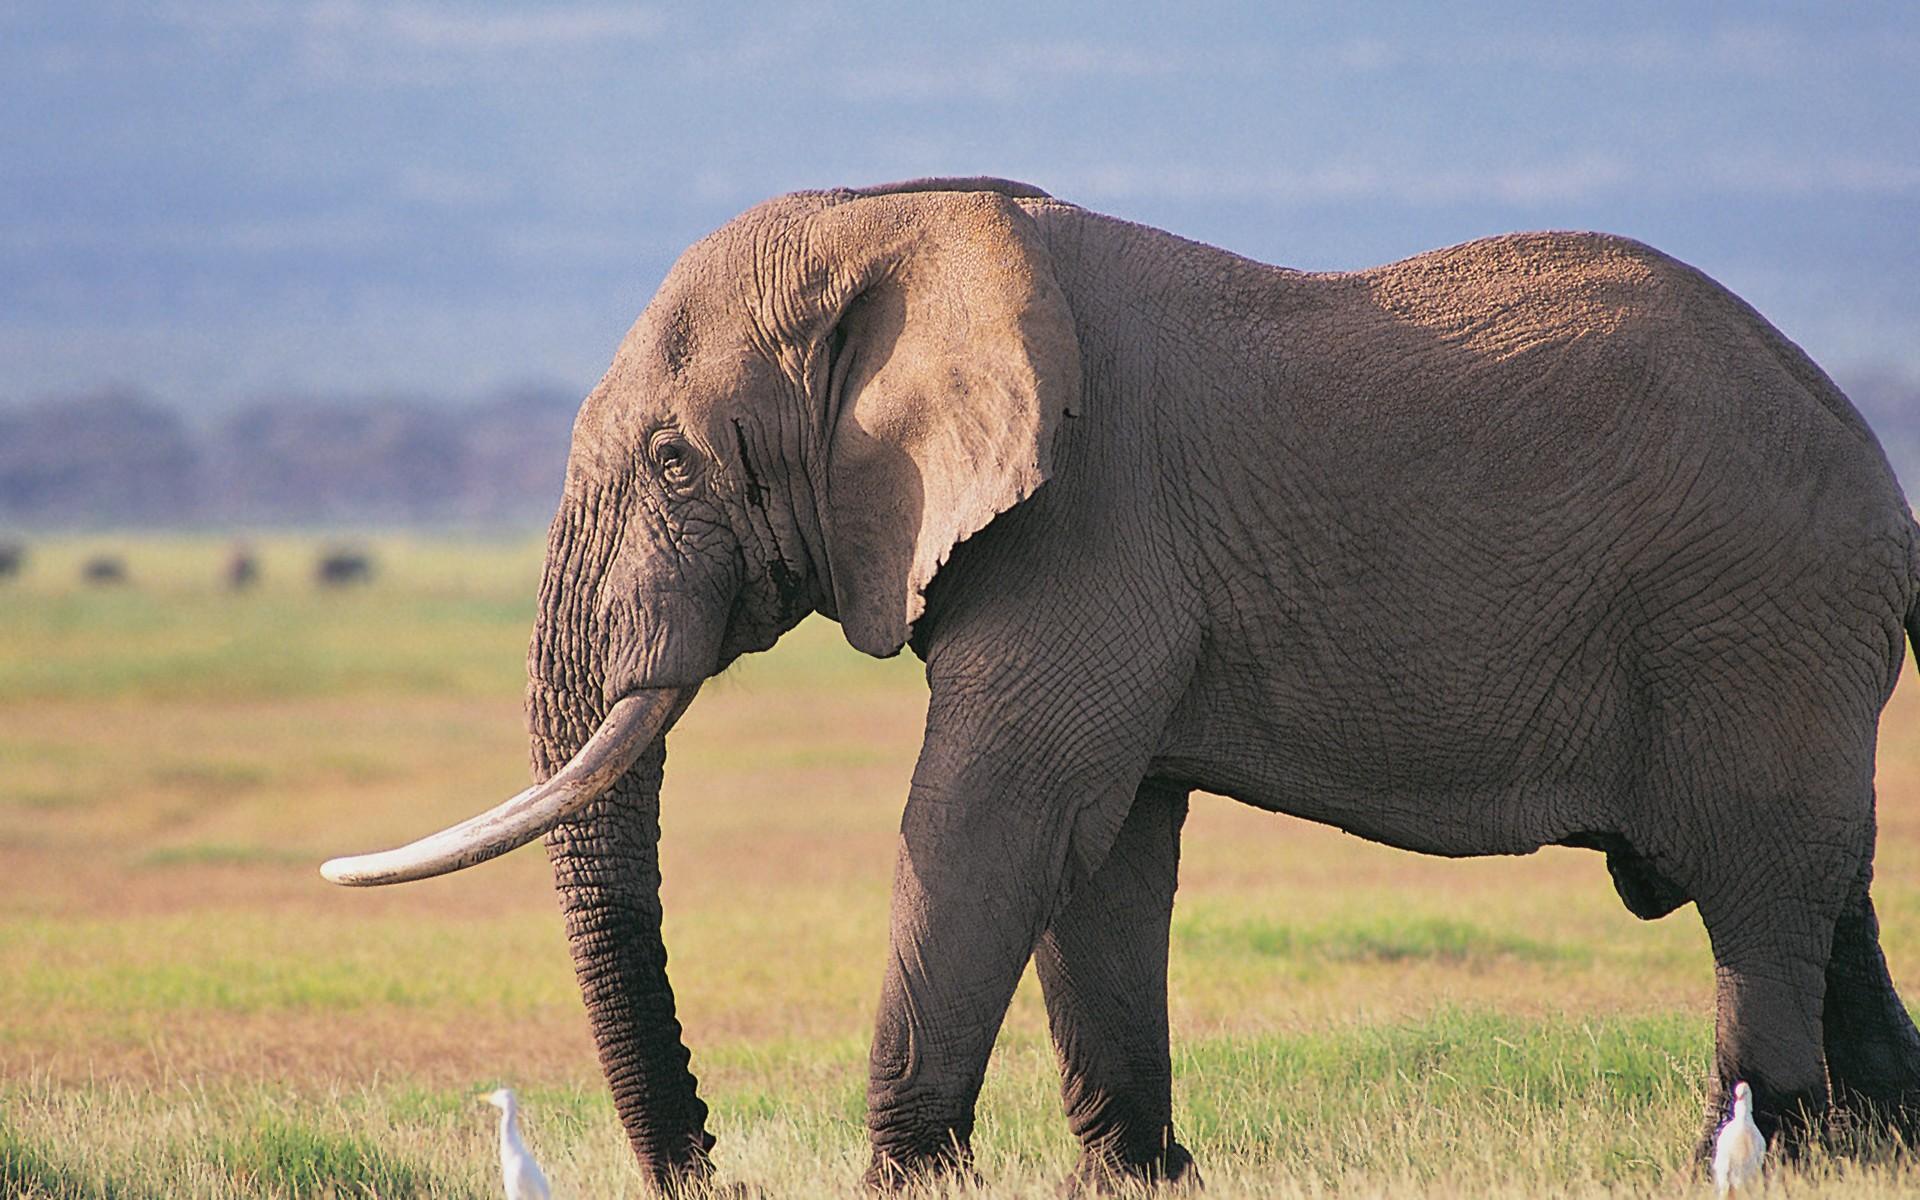 Elephant Wallpaper HD Download